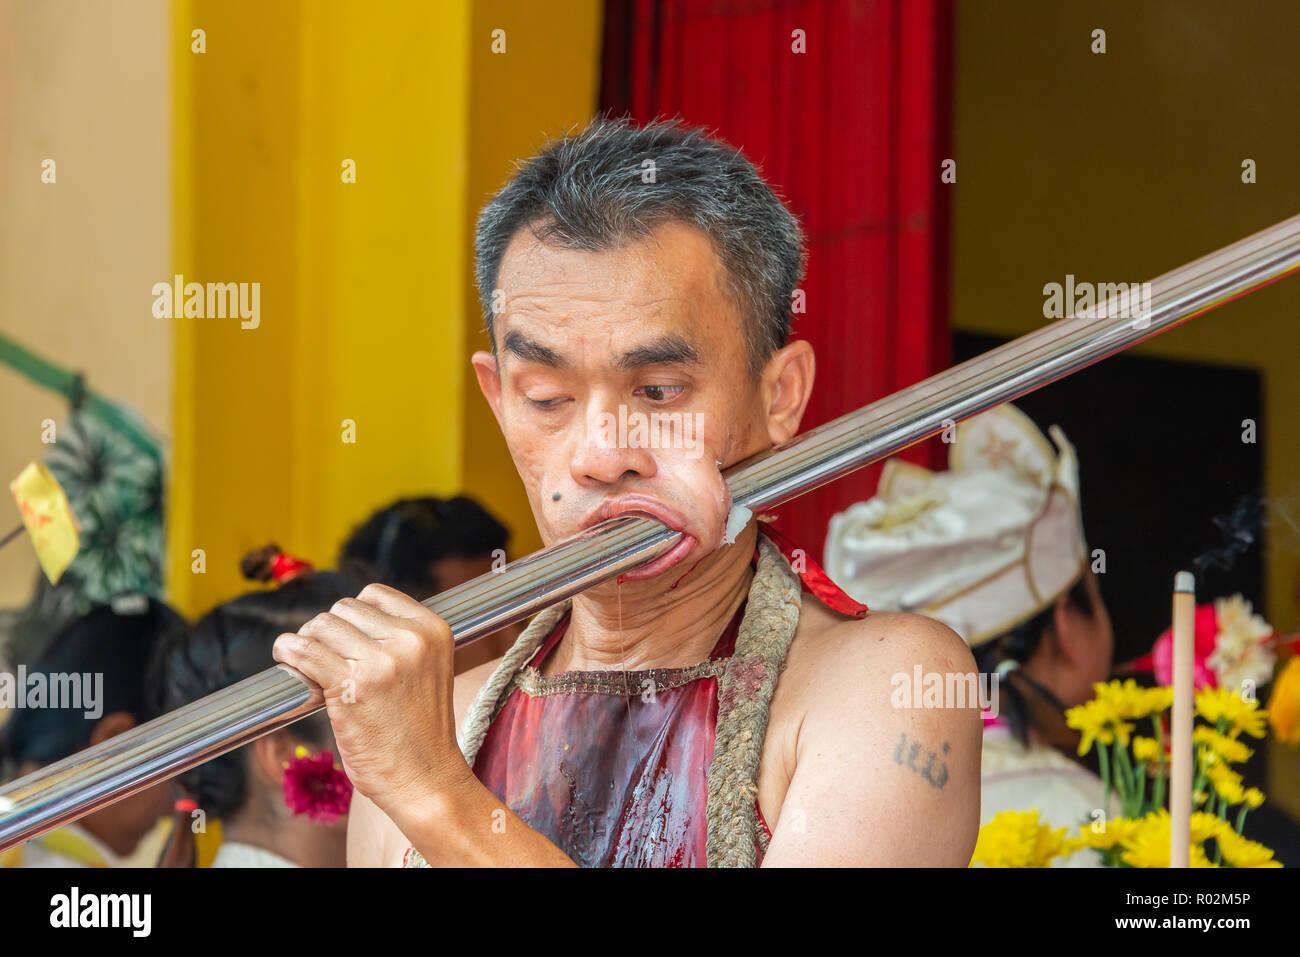 Phang Nga, Thailand - October 14, 2018: Man demonstrating sharp steel run through the mouth in vegetarian festival parade in Phang Nga, Thailand - Stock Image